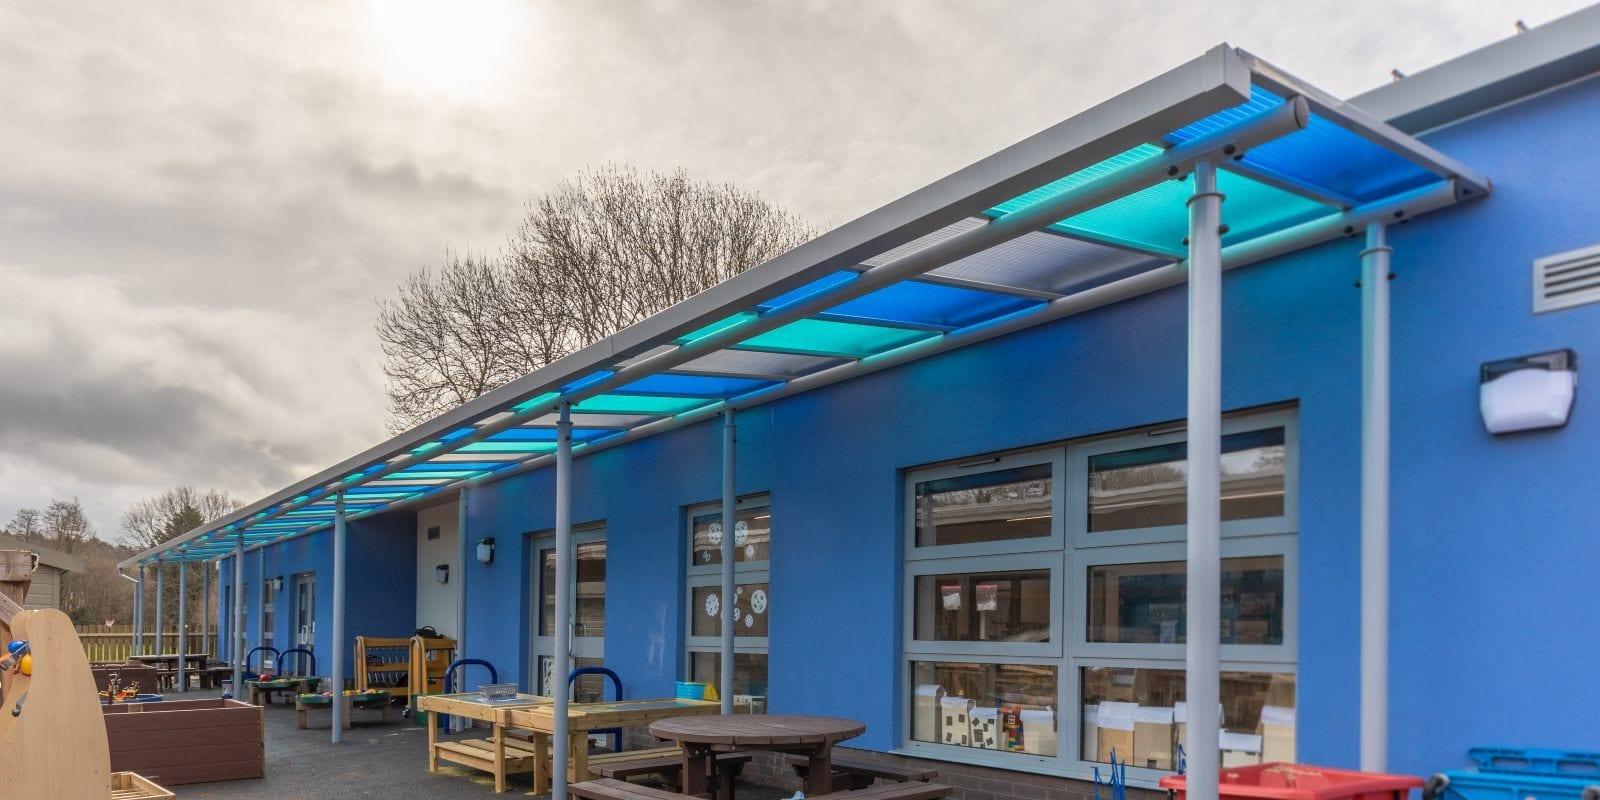 St Nicholas School Colourful Canopy